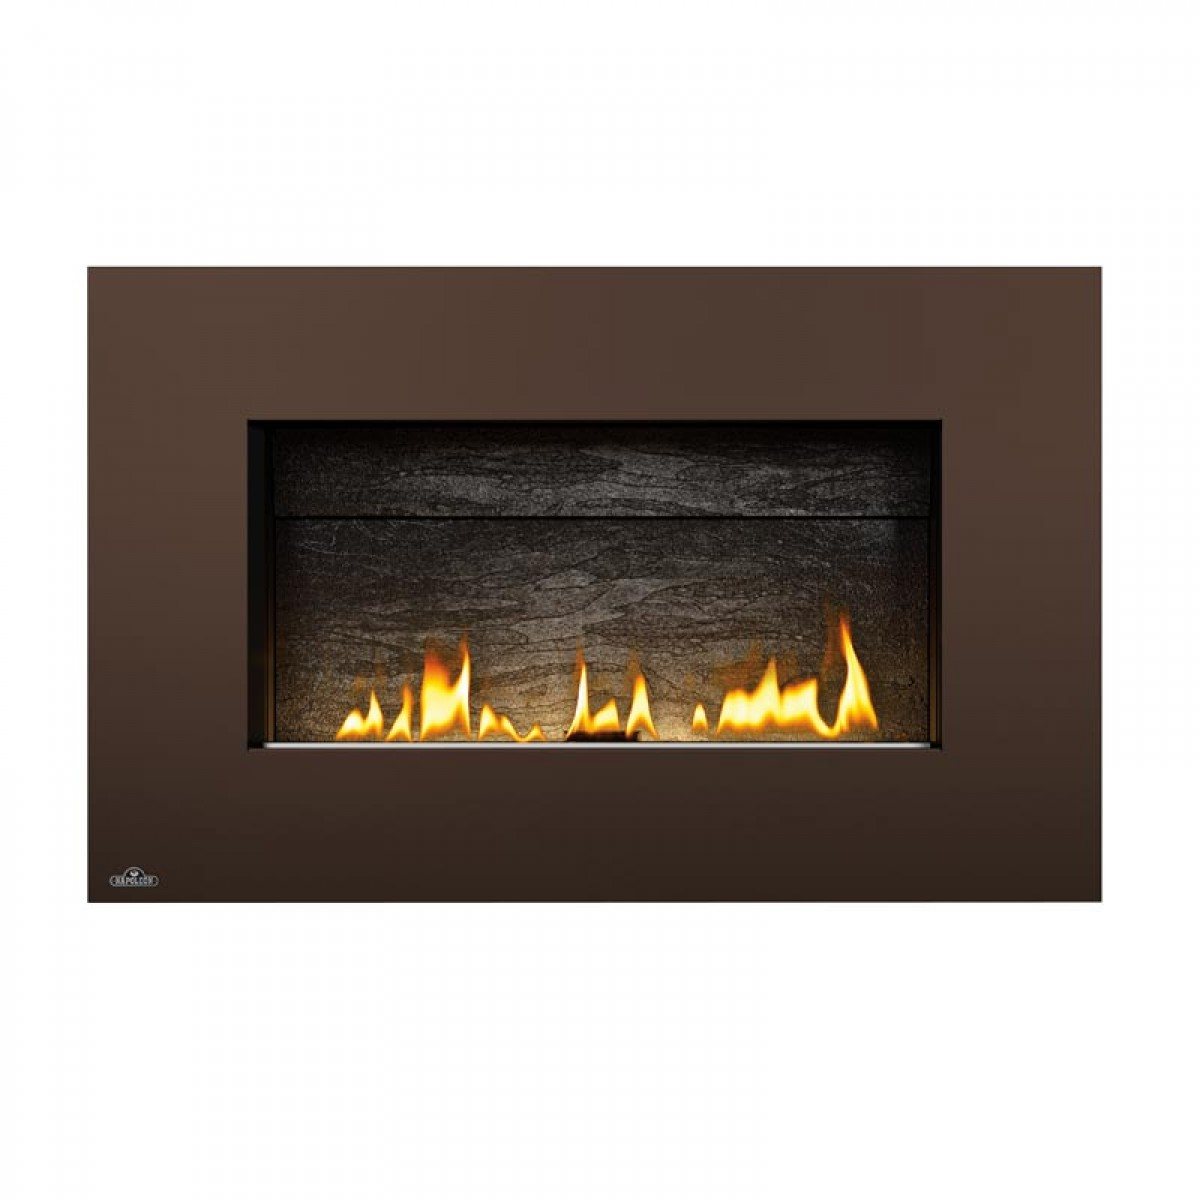 Napoleon Whvf31n Plazmafire Vent Free Natural Gas Fireplace W Slate Brick Panel At Ibuyfireplaces